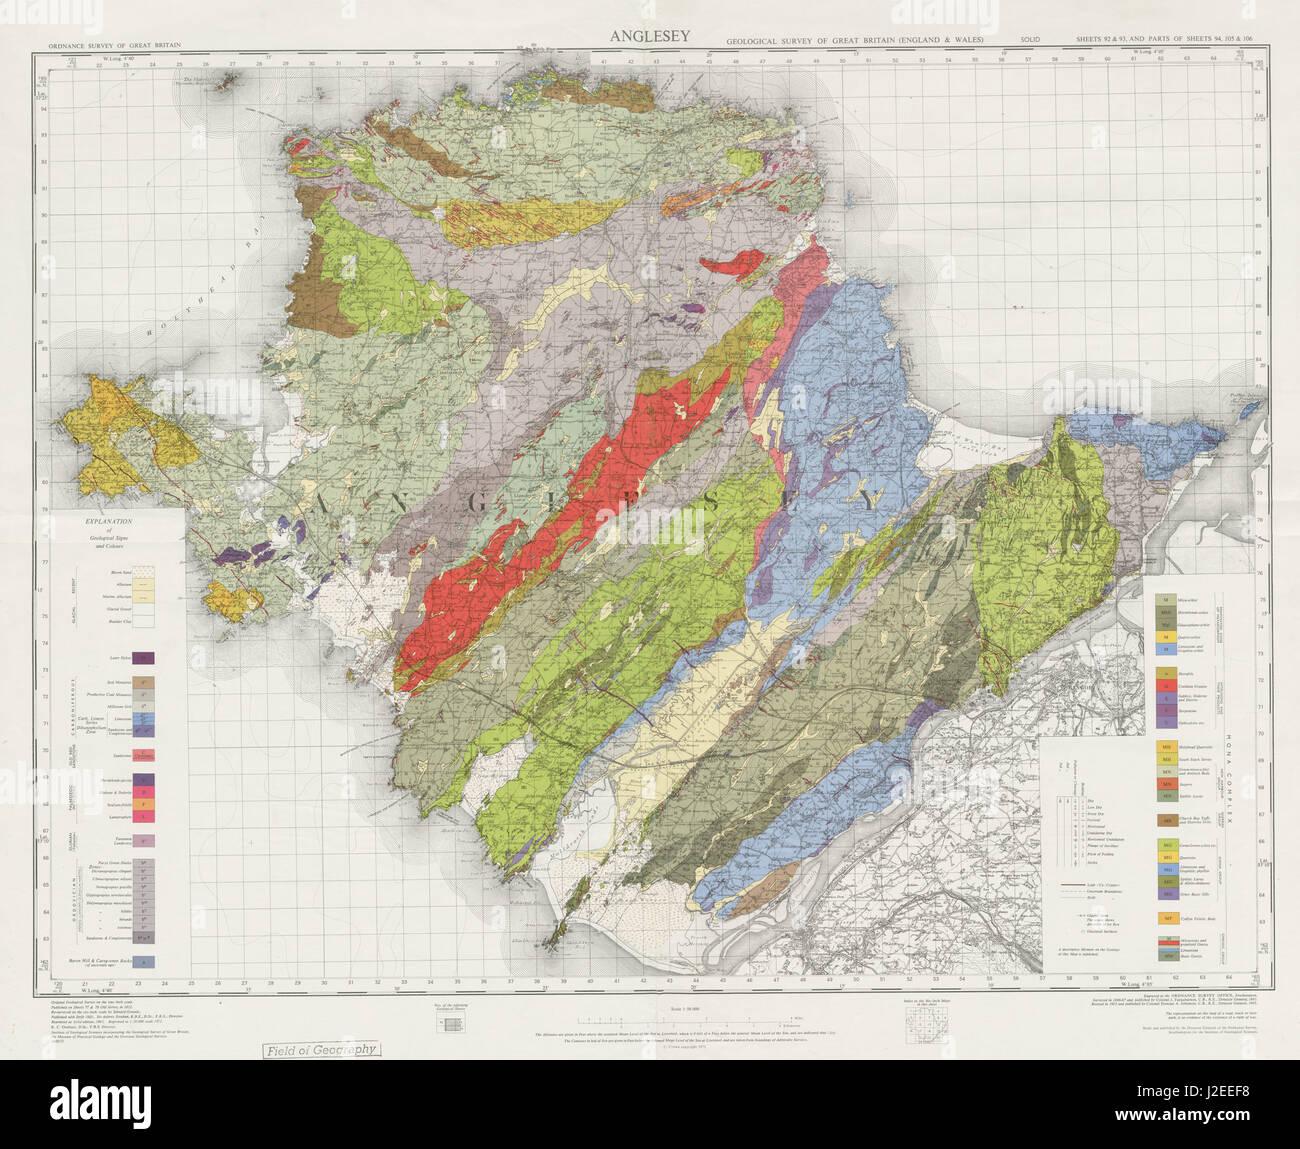 Map Of England Holyhead.Anglesey Geological Survey Wales Bangor Holyhead Caernarfon 1972 Old